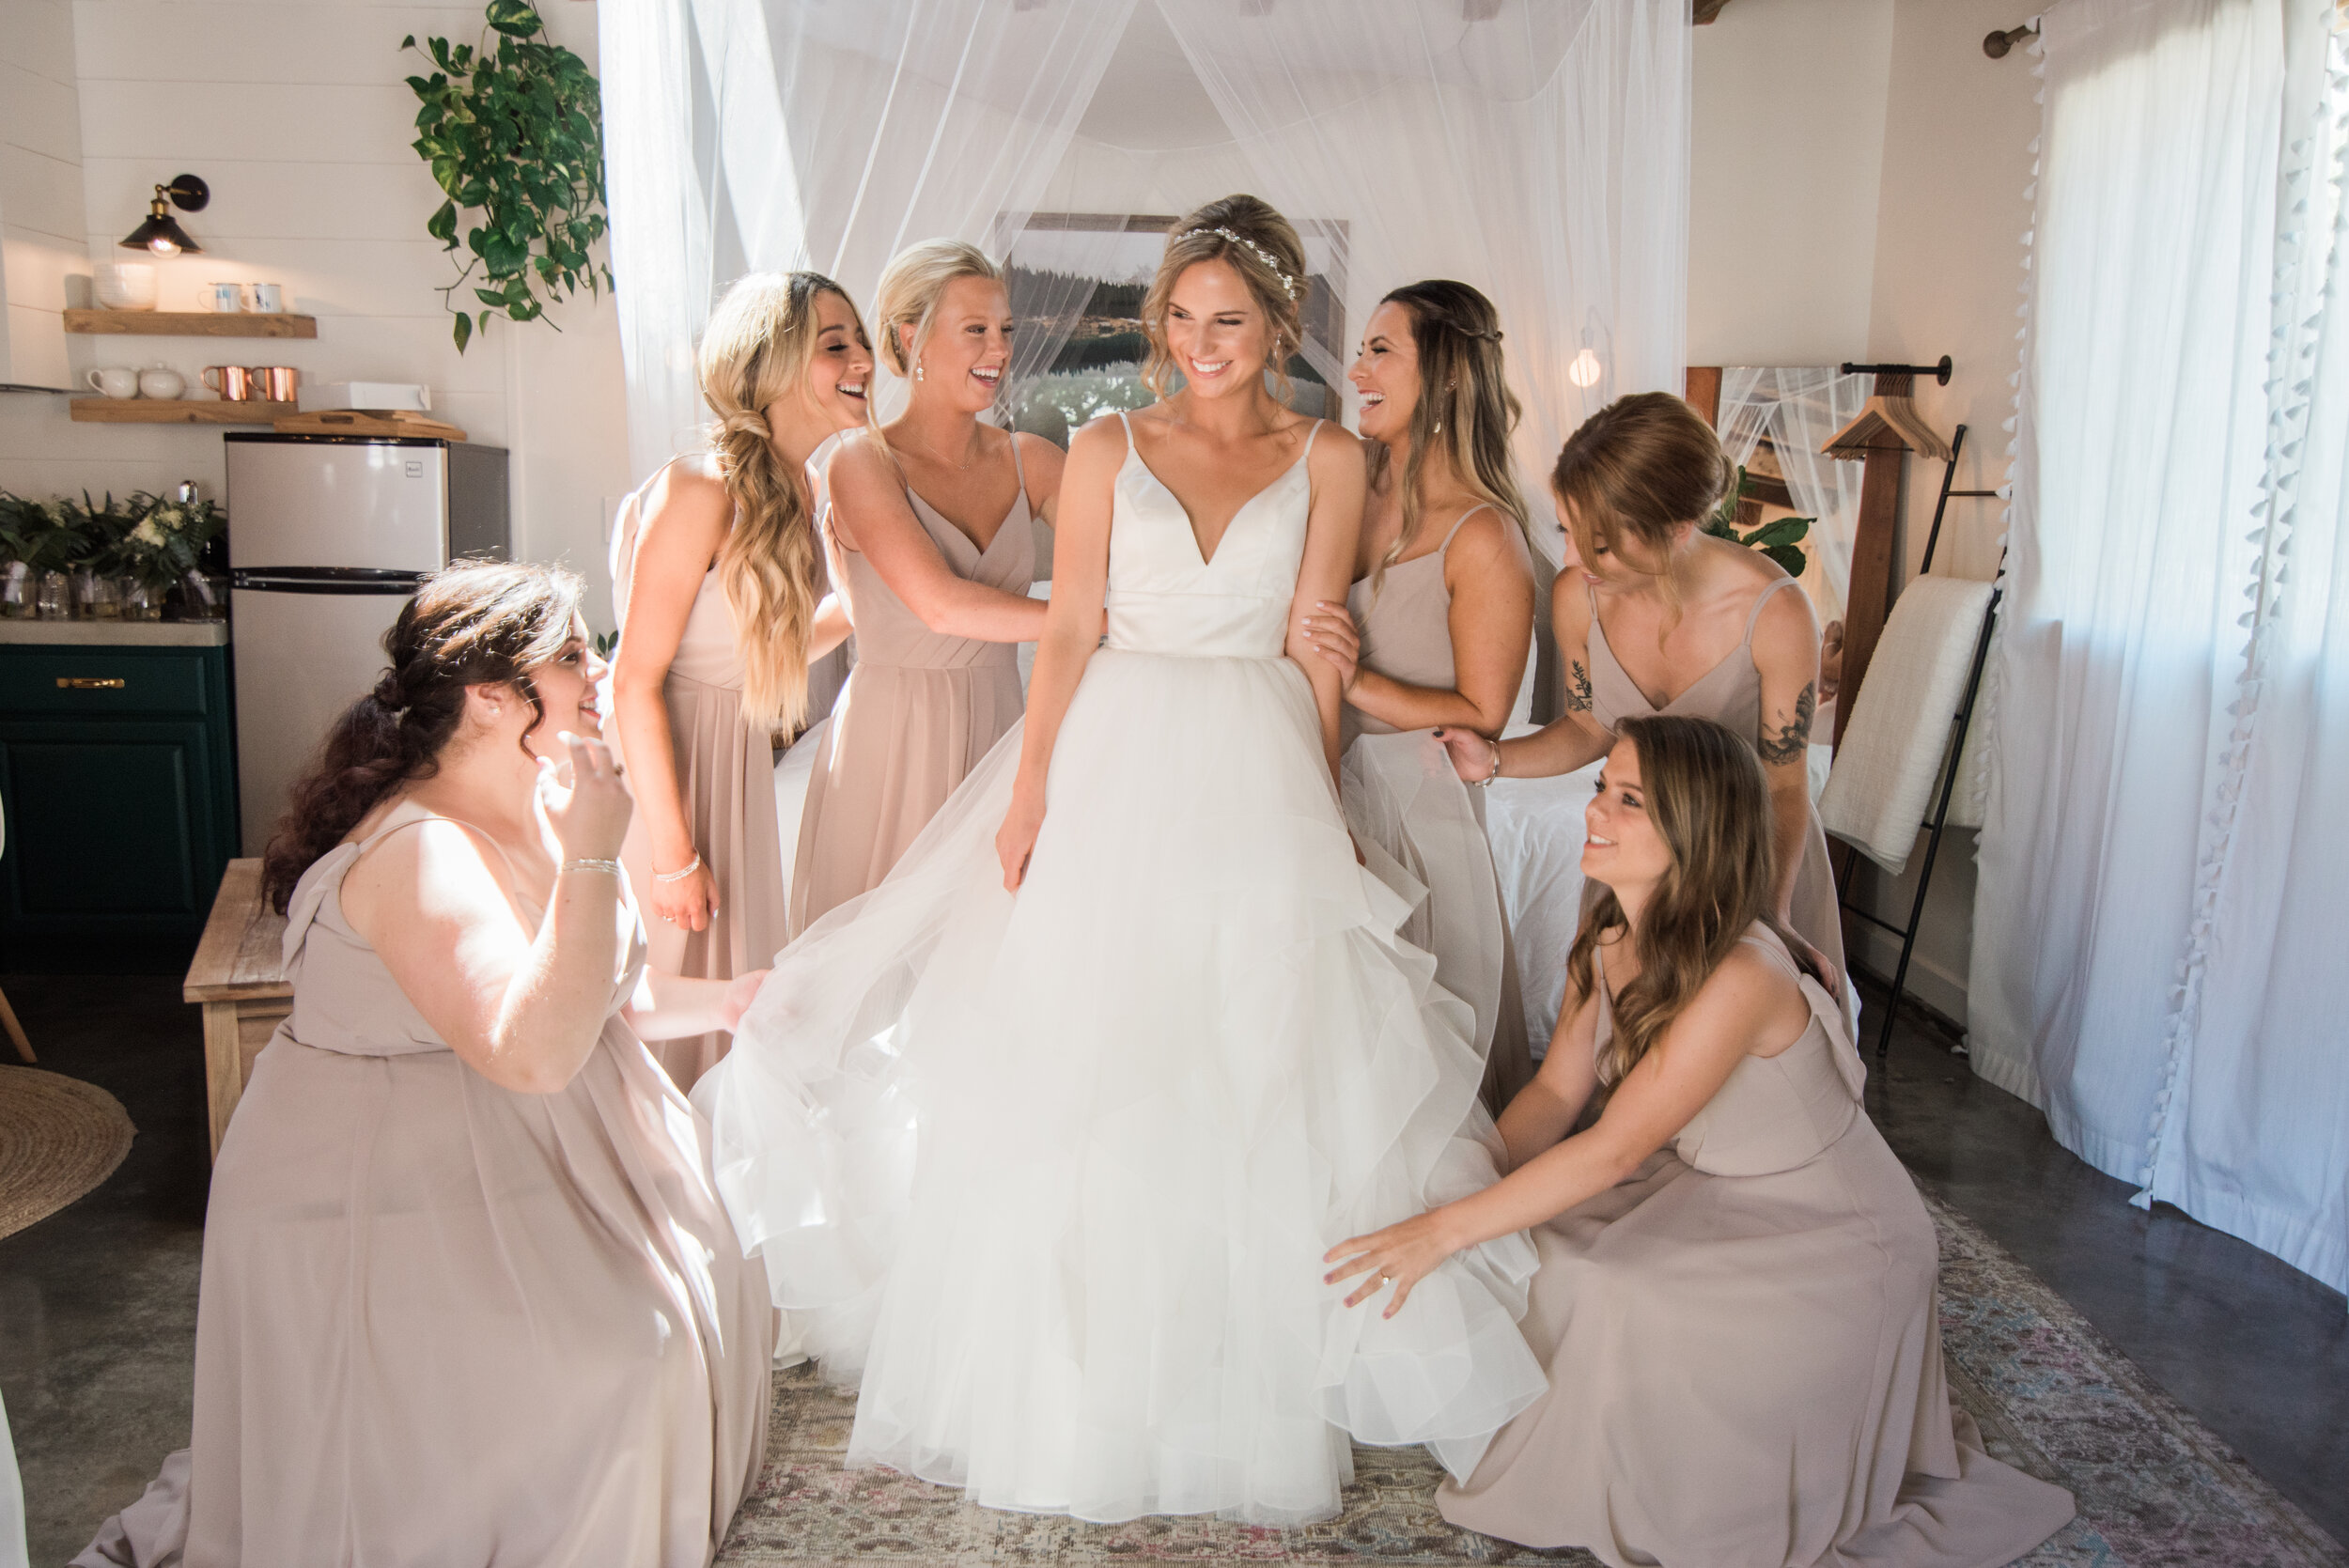 Brooke Brett Honest In Ivory A Spokane Bridal Shop,Beach Dress Wedding Guest